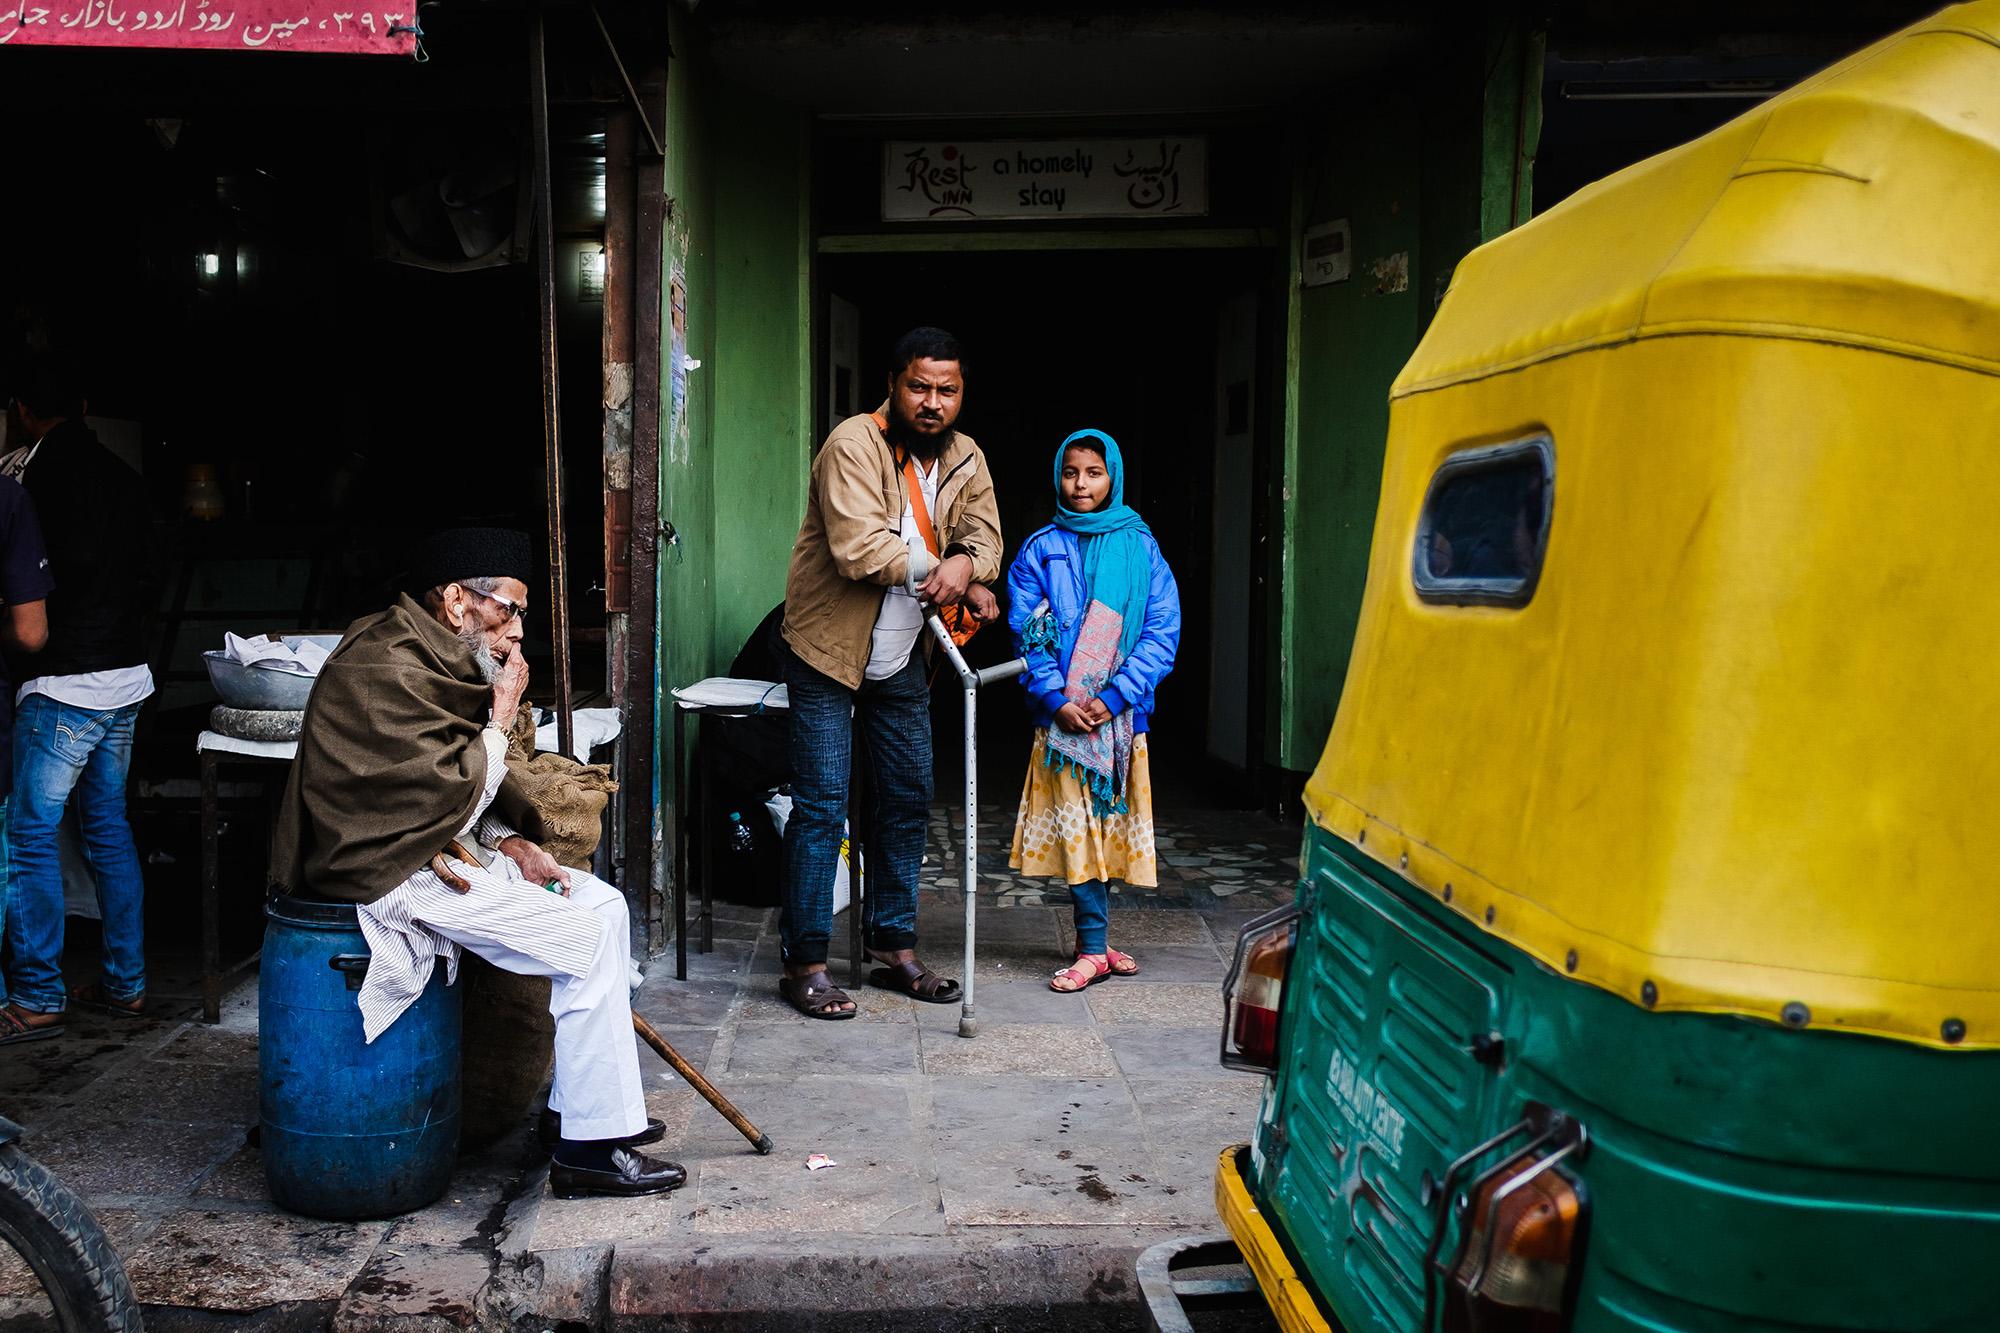 AnjaPoehlmann_India-Delhi_003.jpg